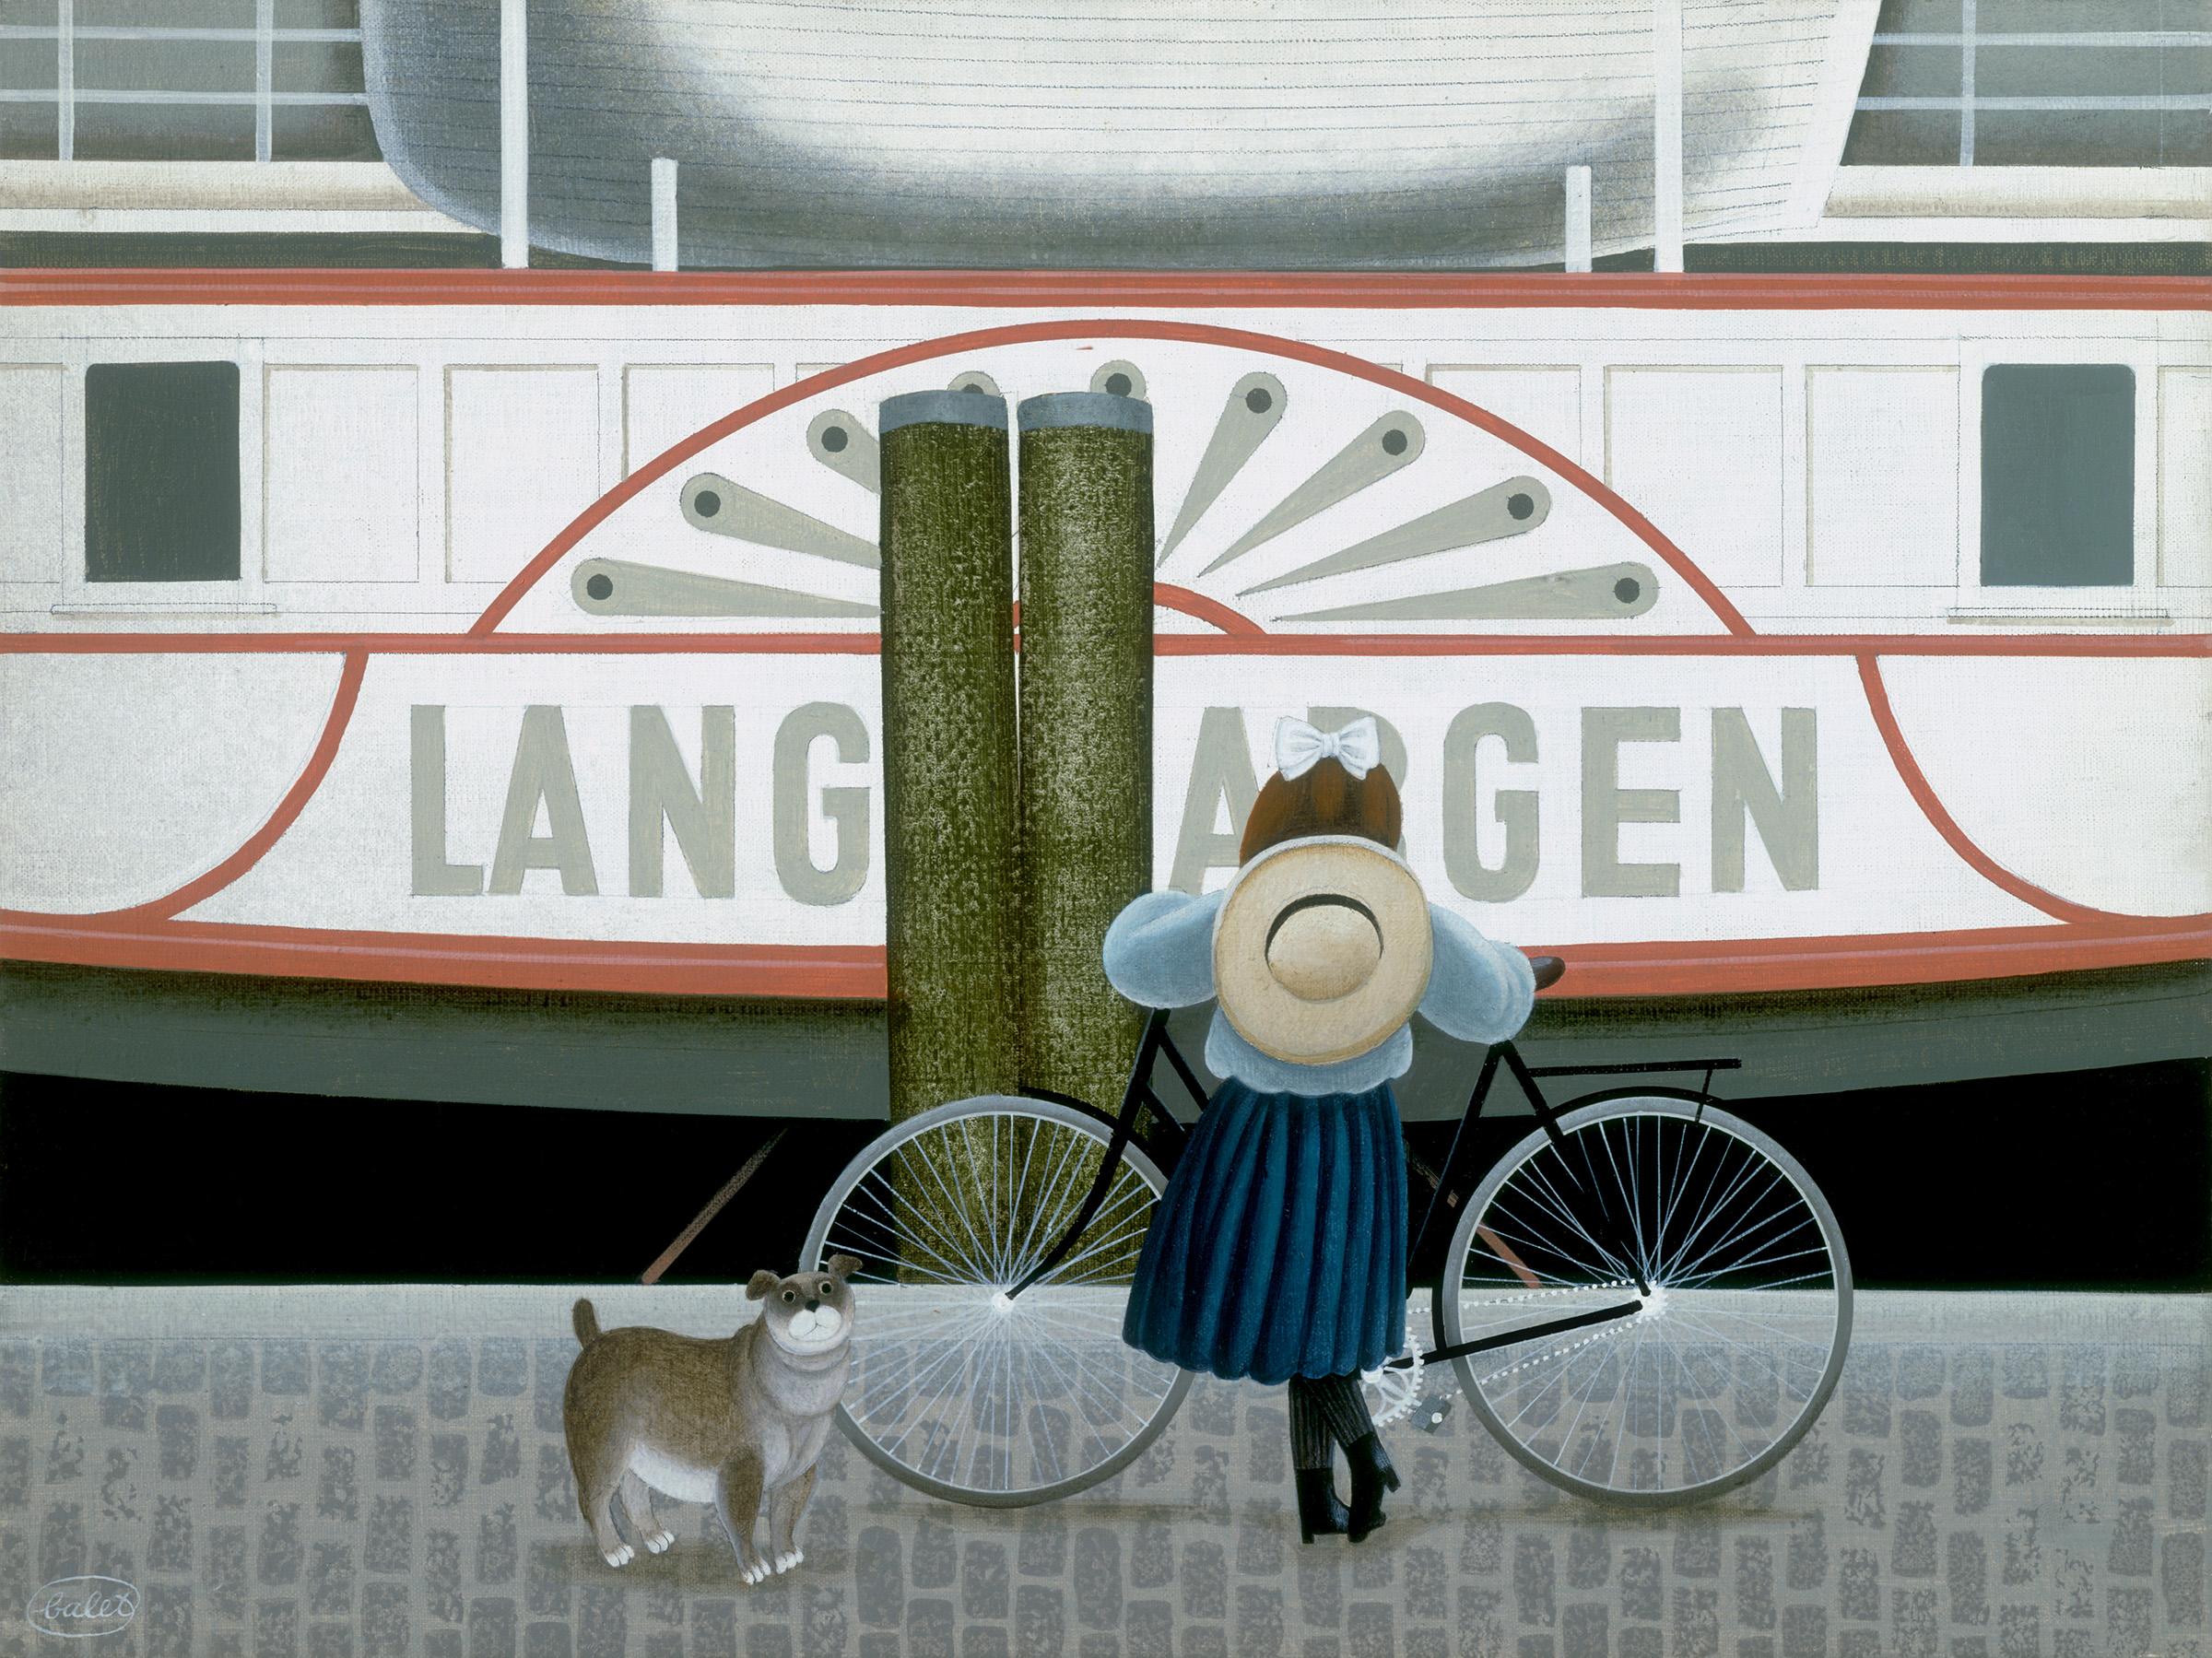 Waiting for the Langenargen